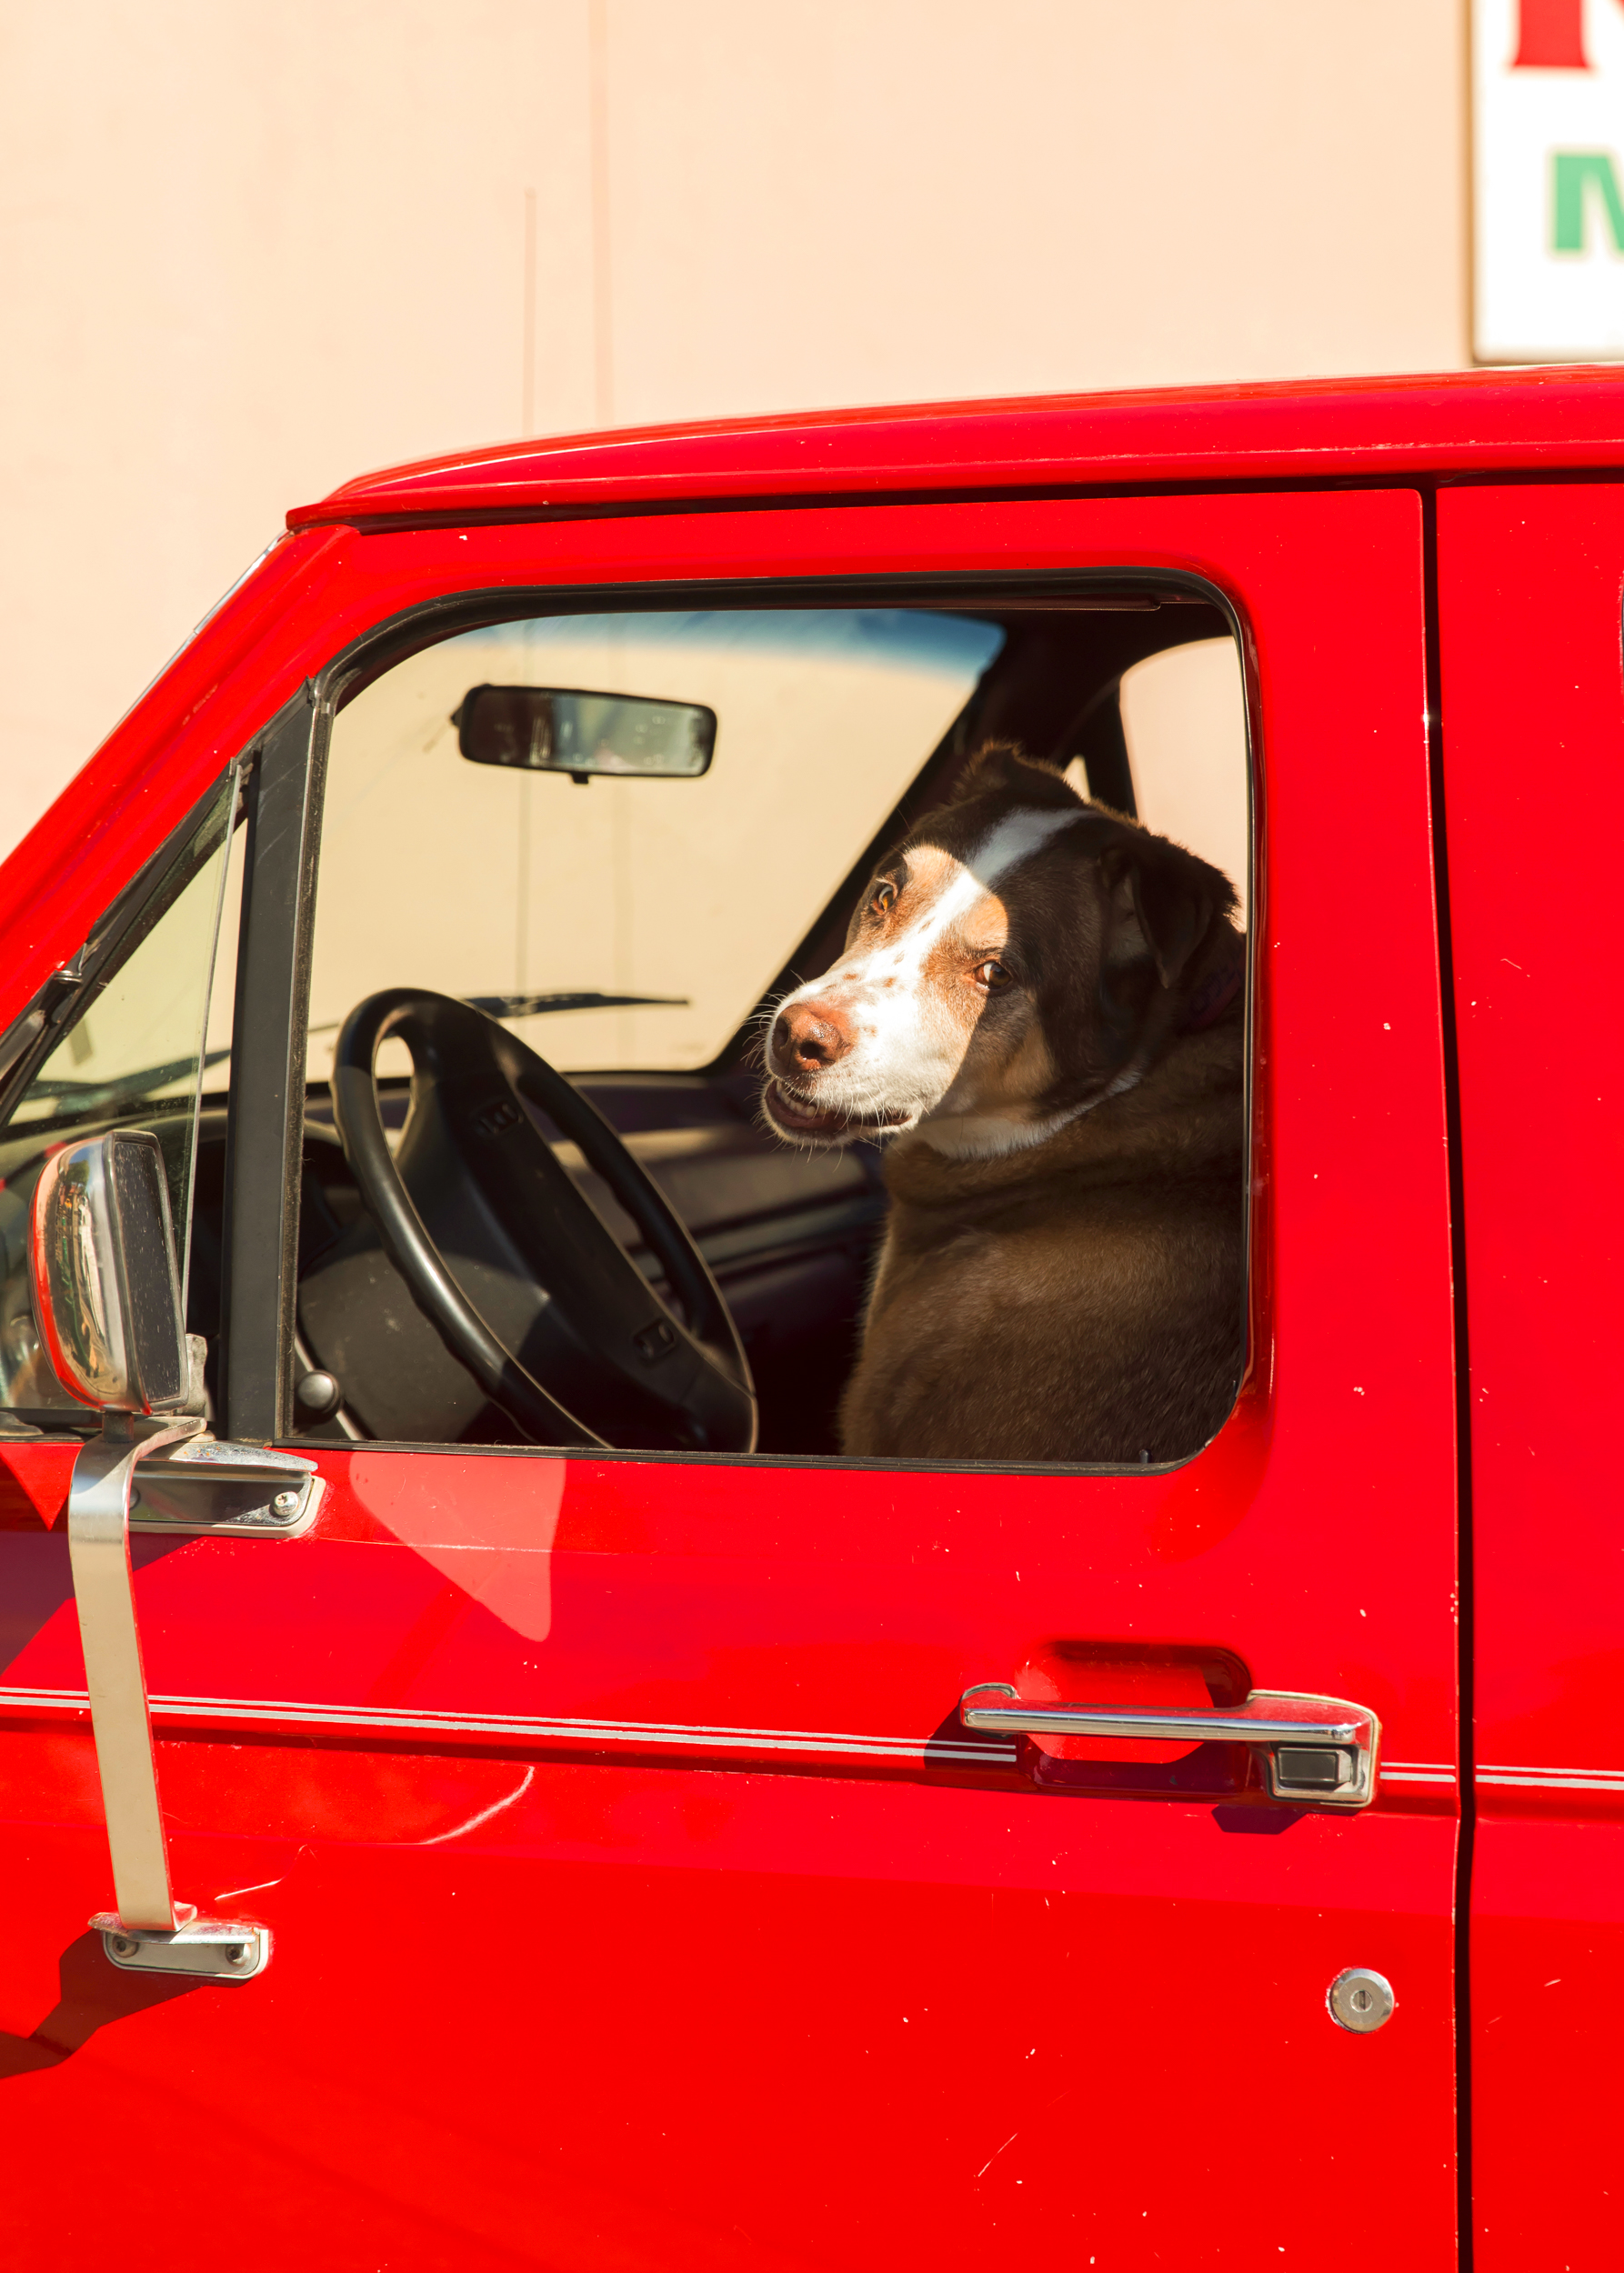 TruckDoggo_10Inches.jpg